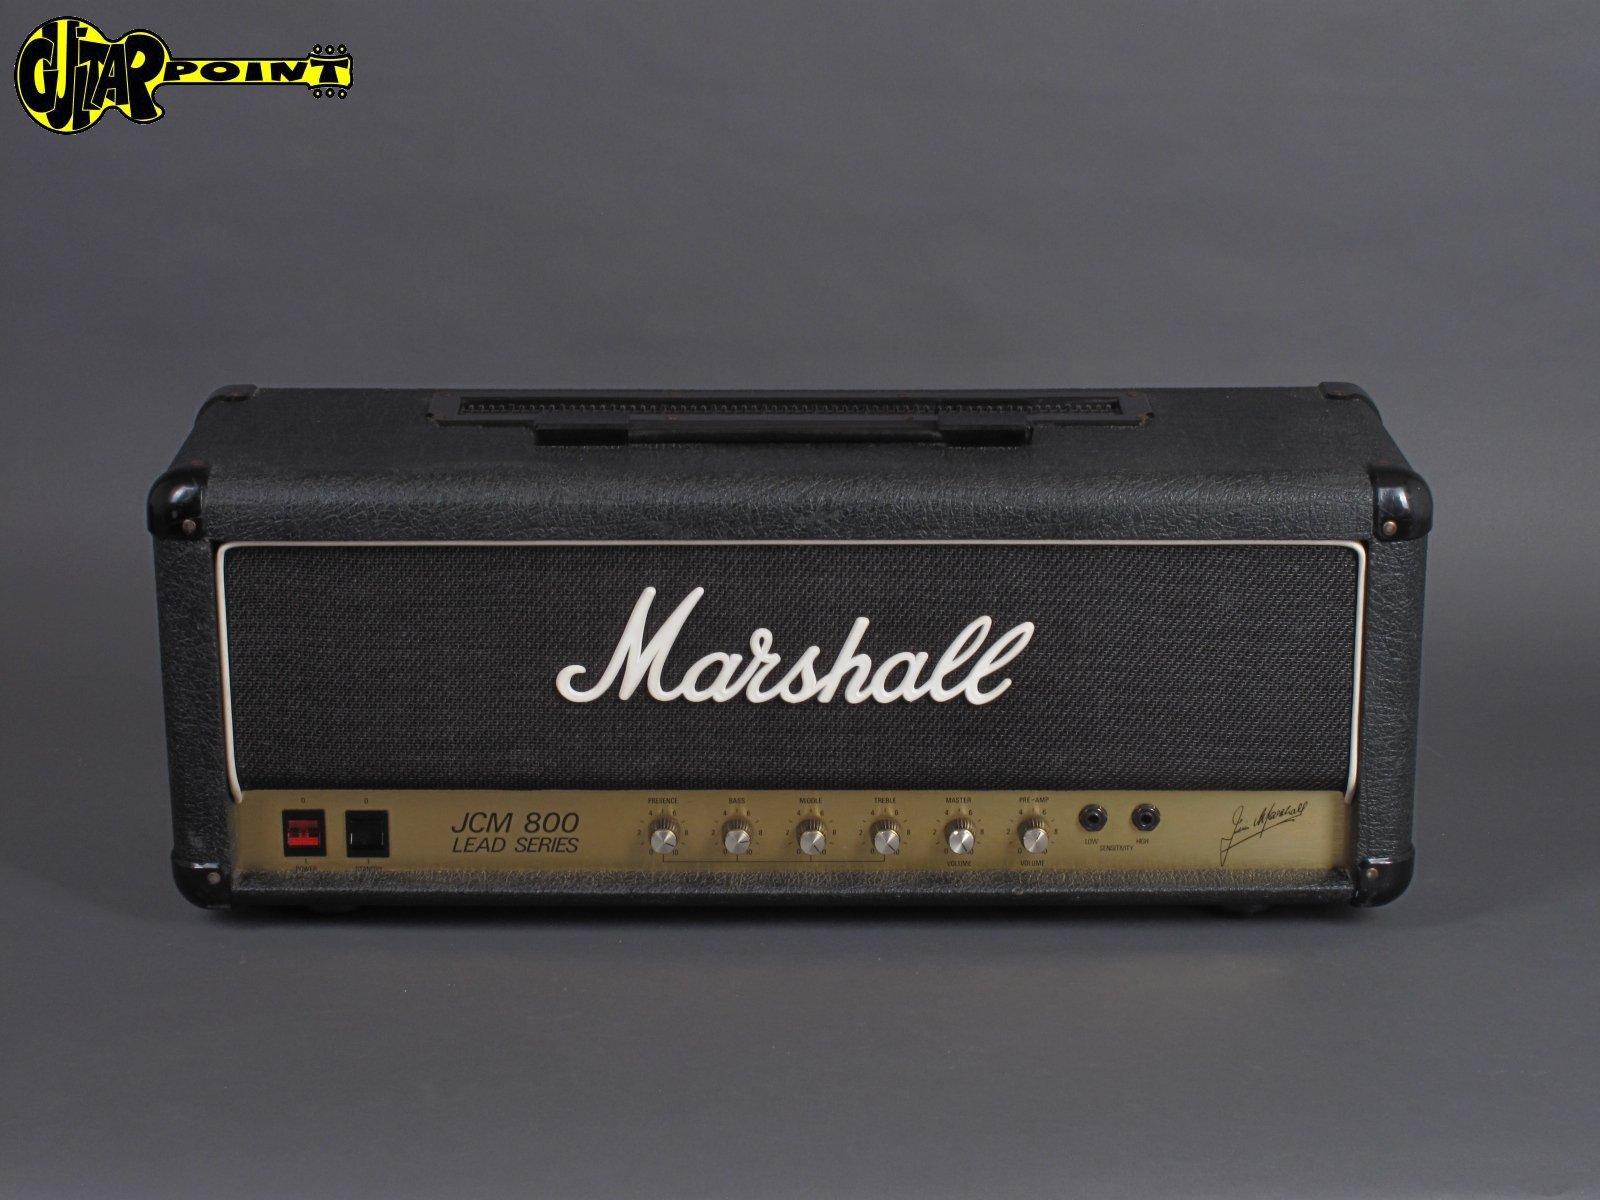 1989 Marshall JCM800 MK2 Lead /100W - Model 2203